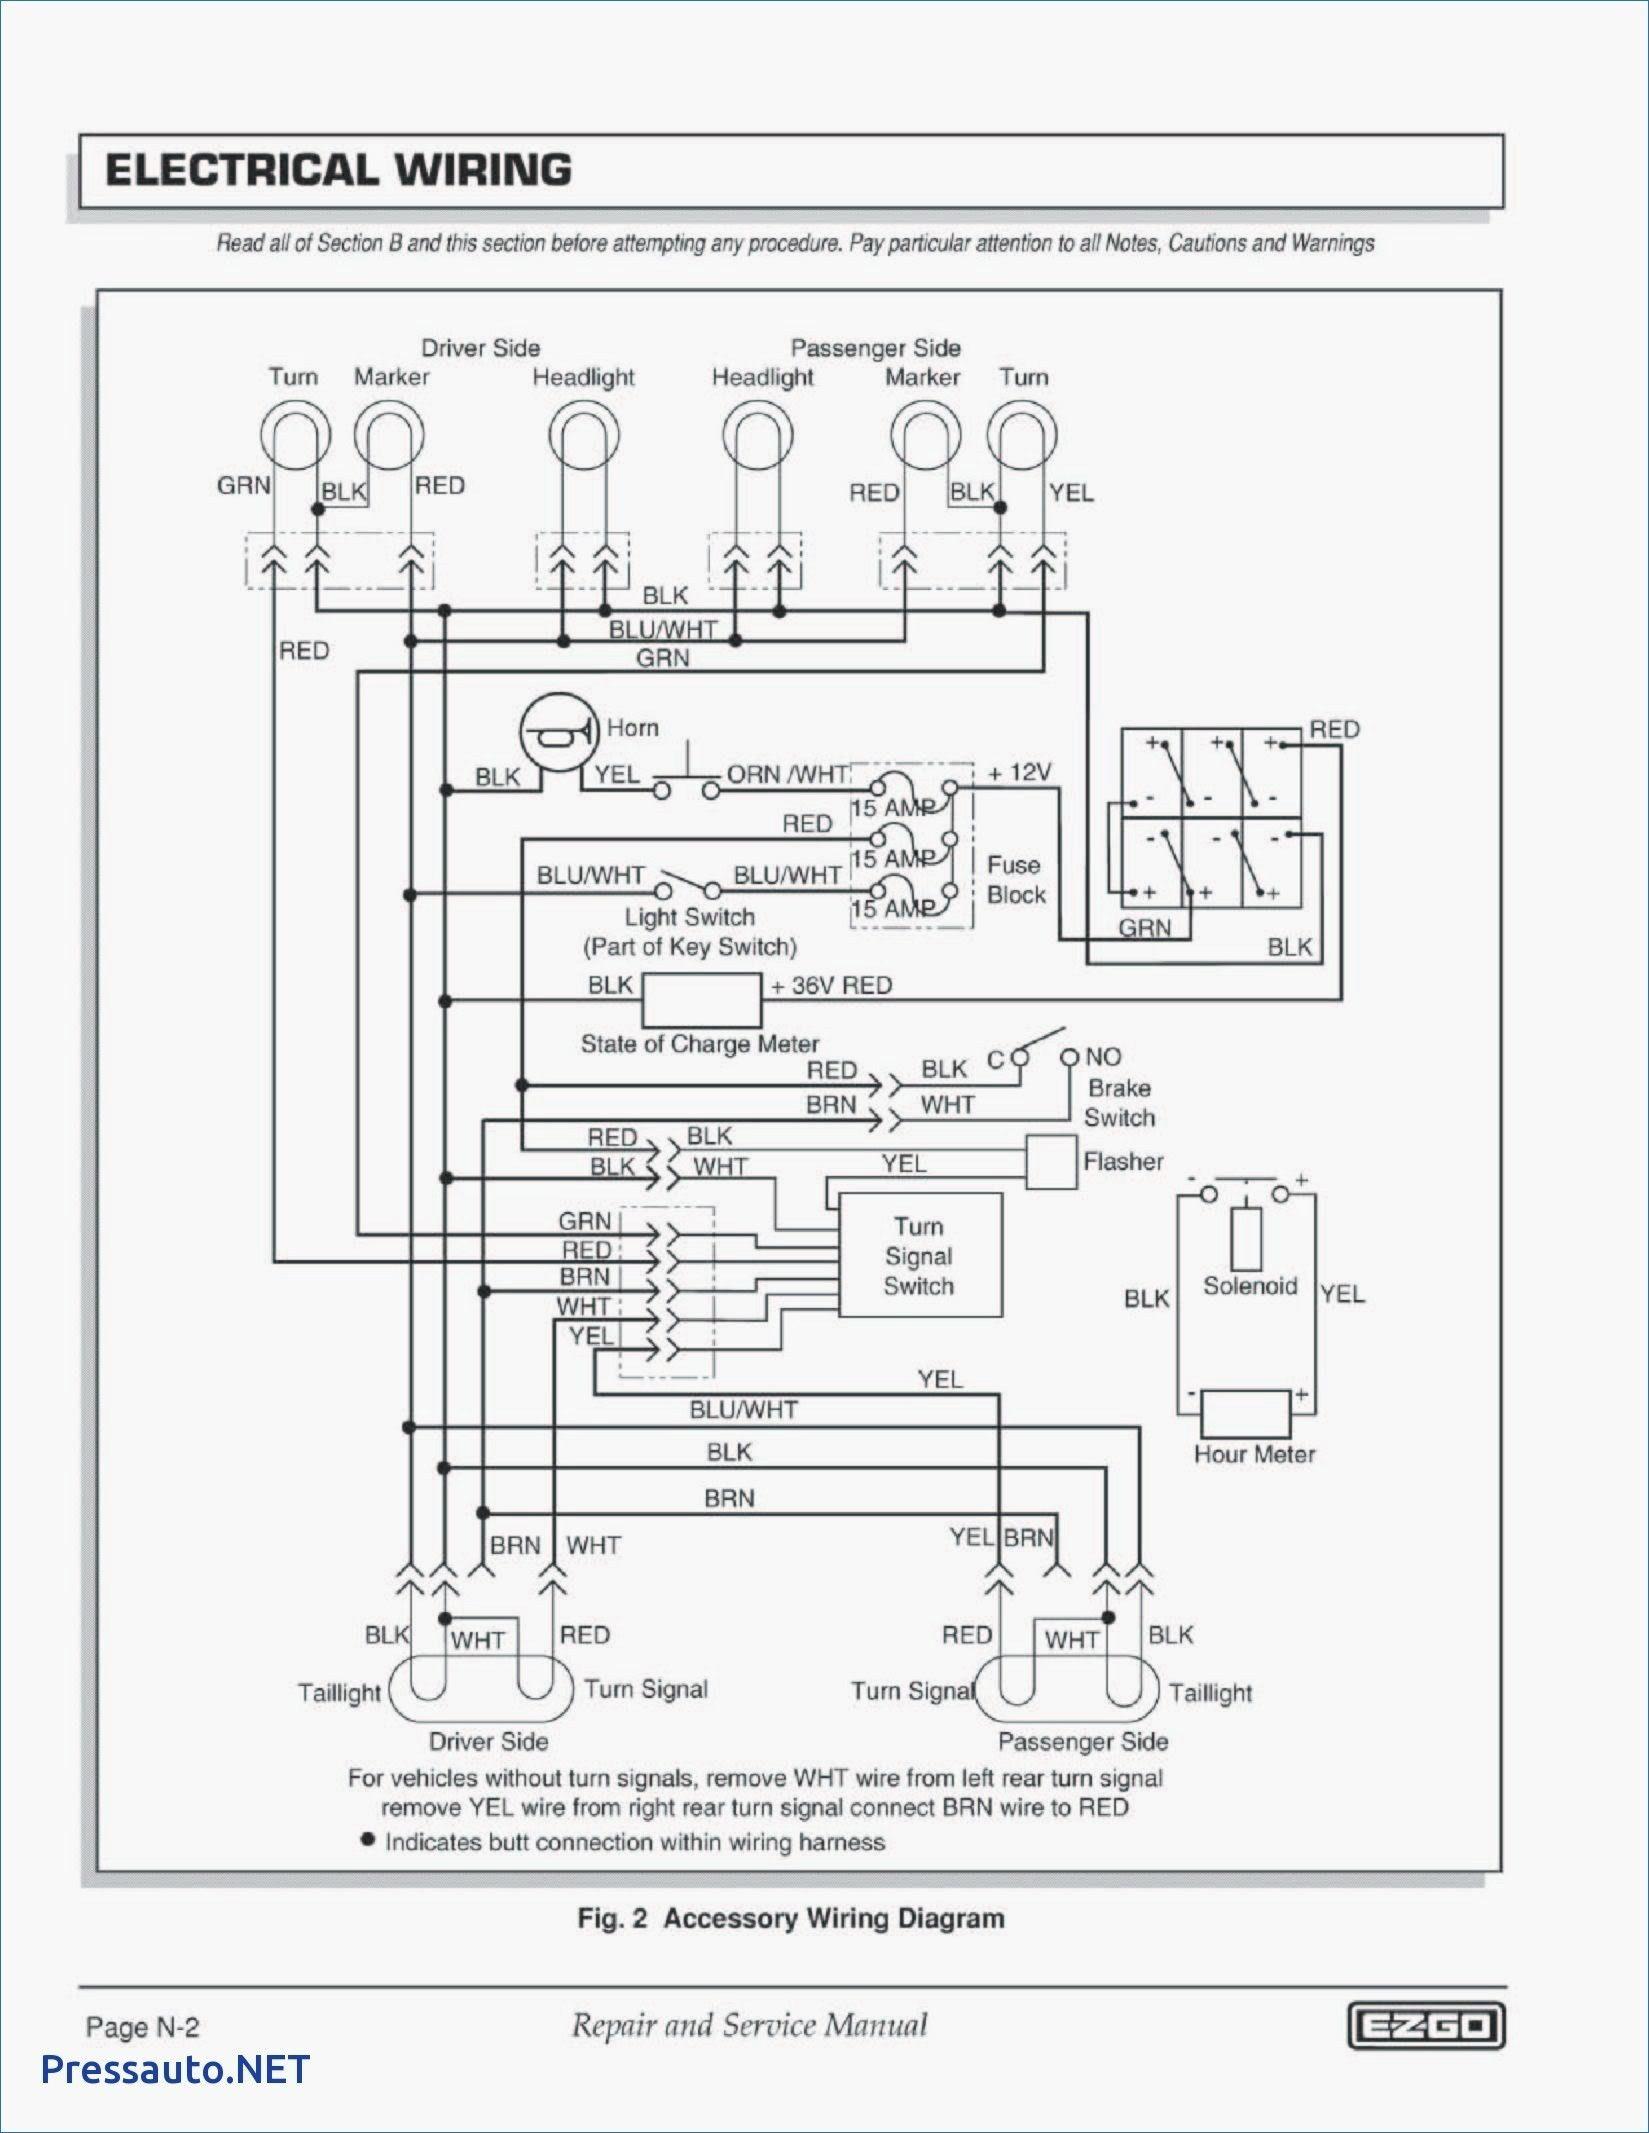 Diagram Diagramtemplate Diagramsample Check More At Https Servisi Co Wiring Diagram For 2006 Club Car Precedent 48 Volt